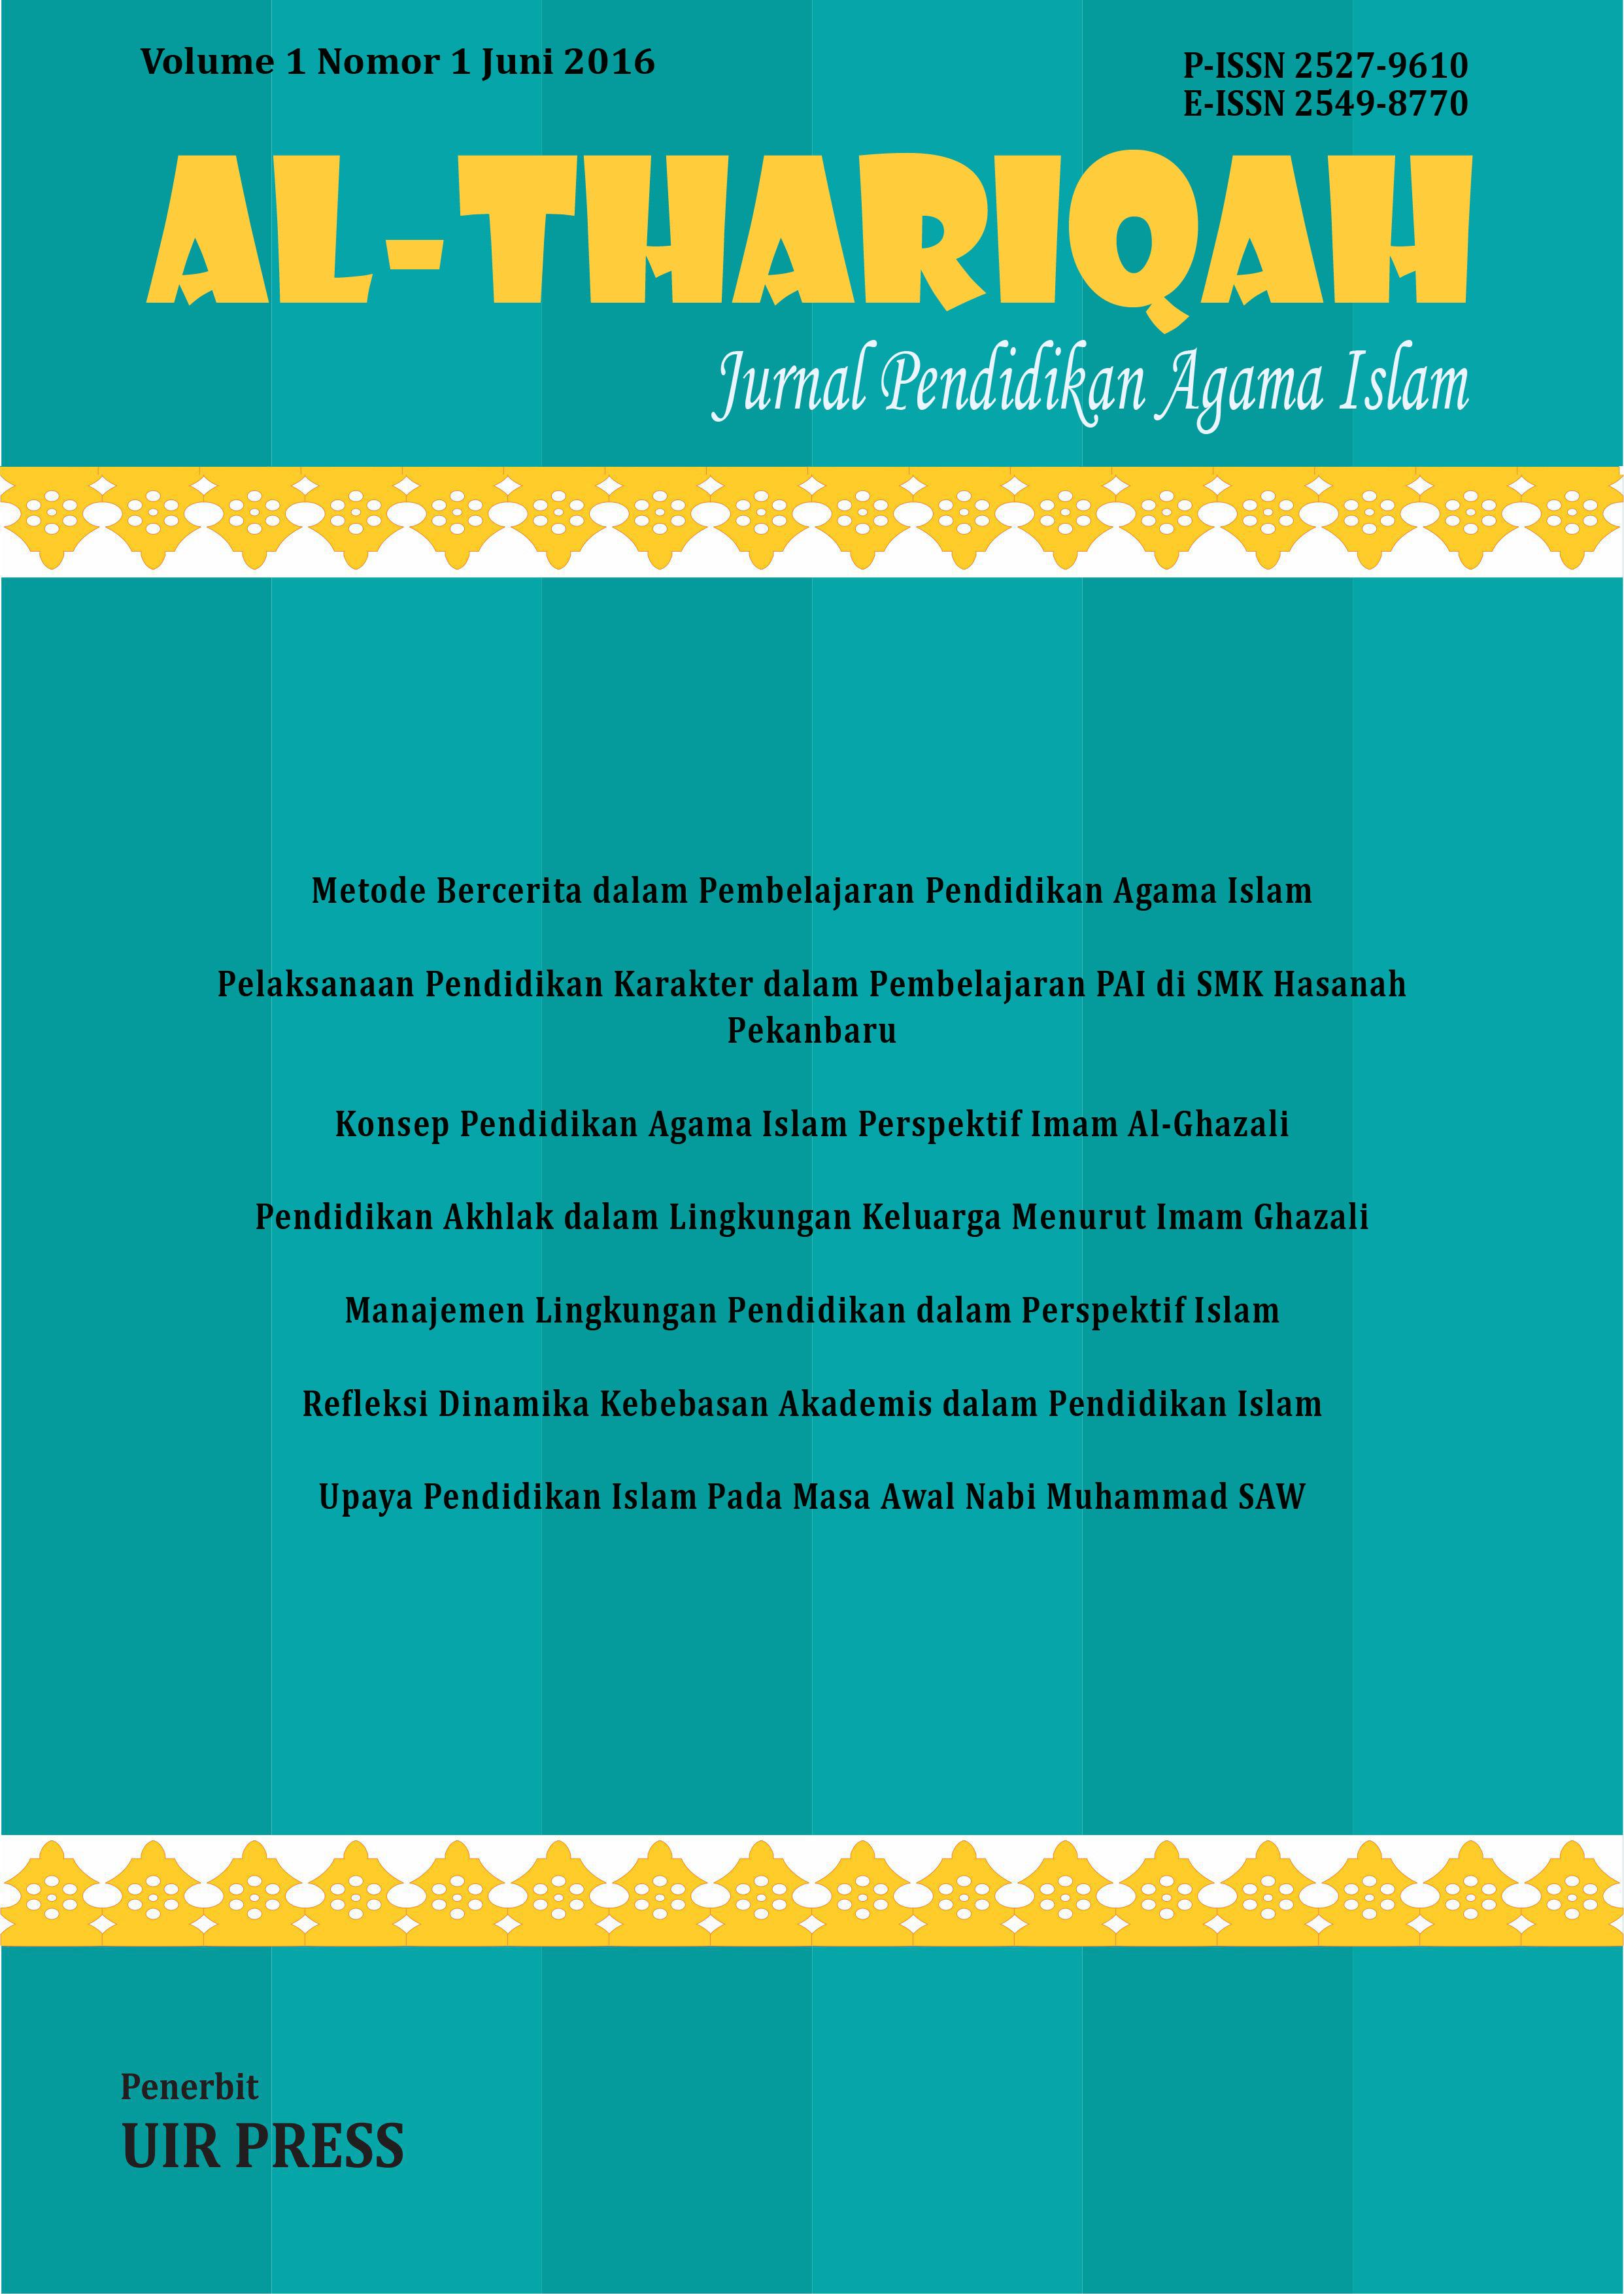 Konsep Pendidikan Agama Islam Perspektif Imam Al Ghazali Jurnal